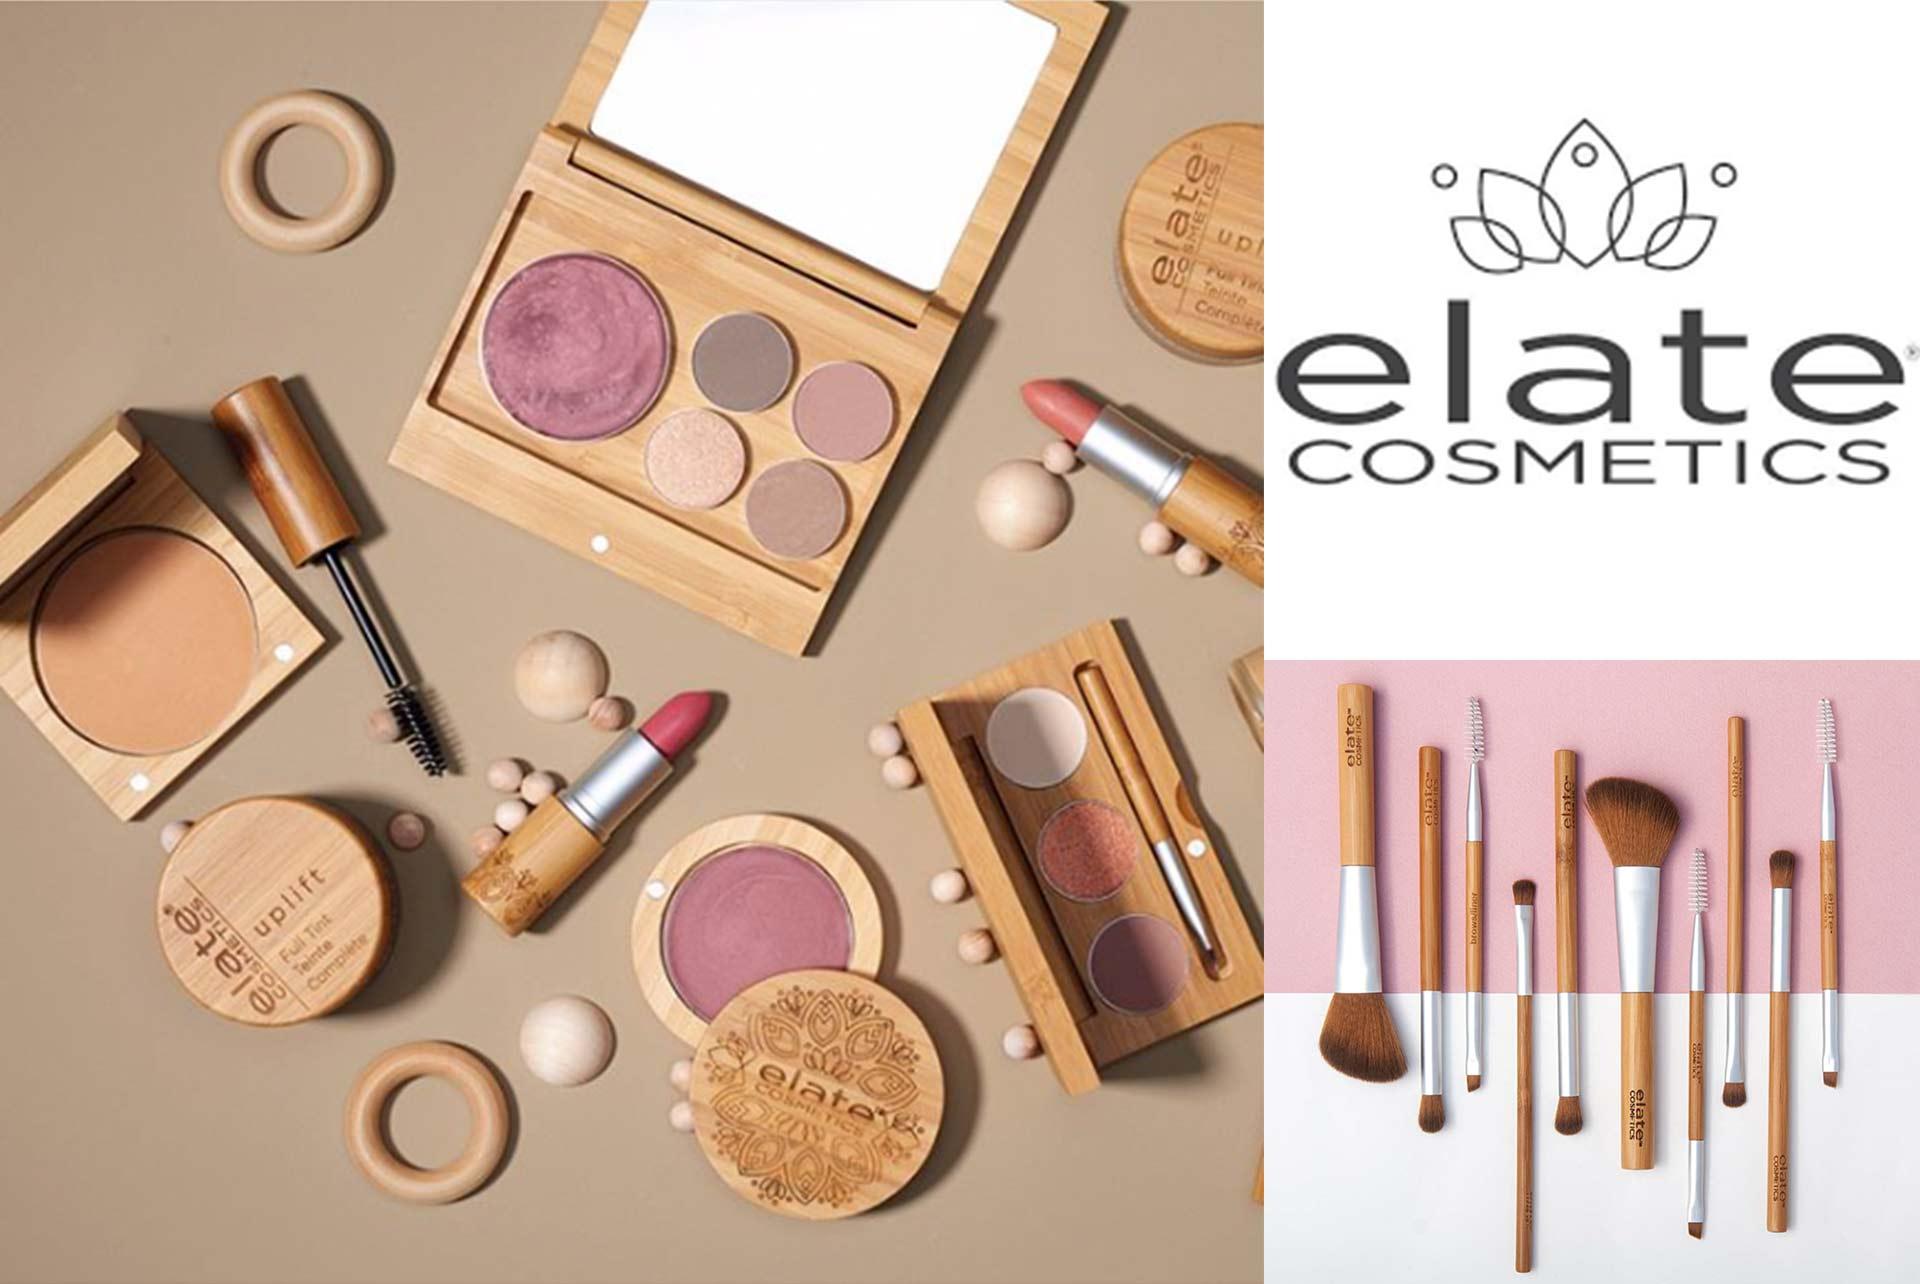 Is Elate Cosmetics Cruelty-Free & Vegan?